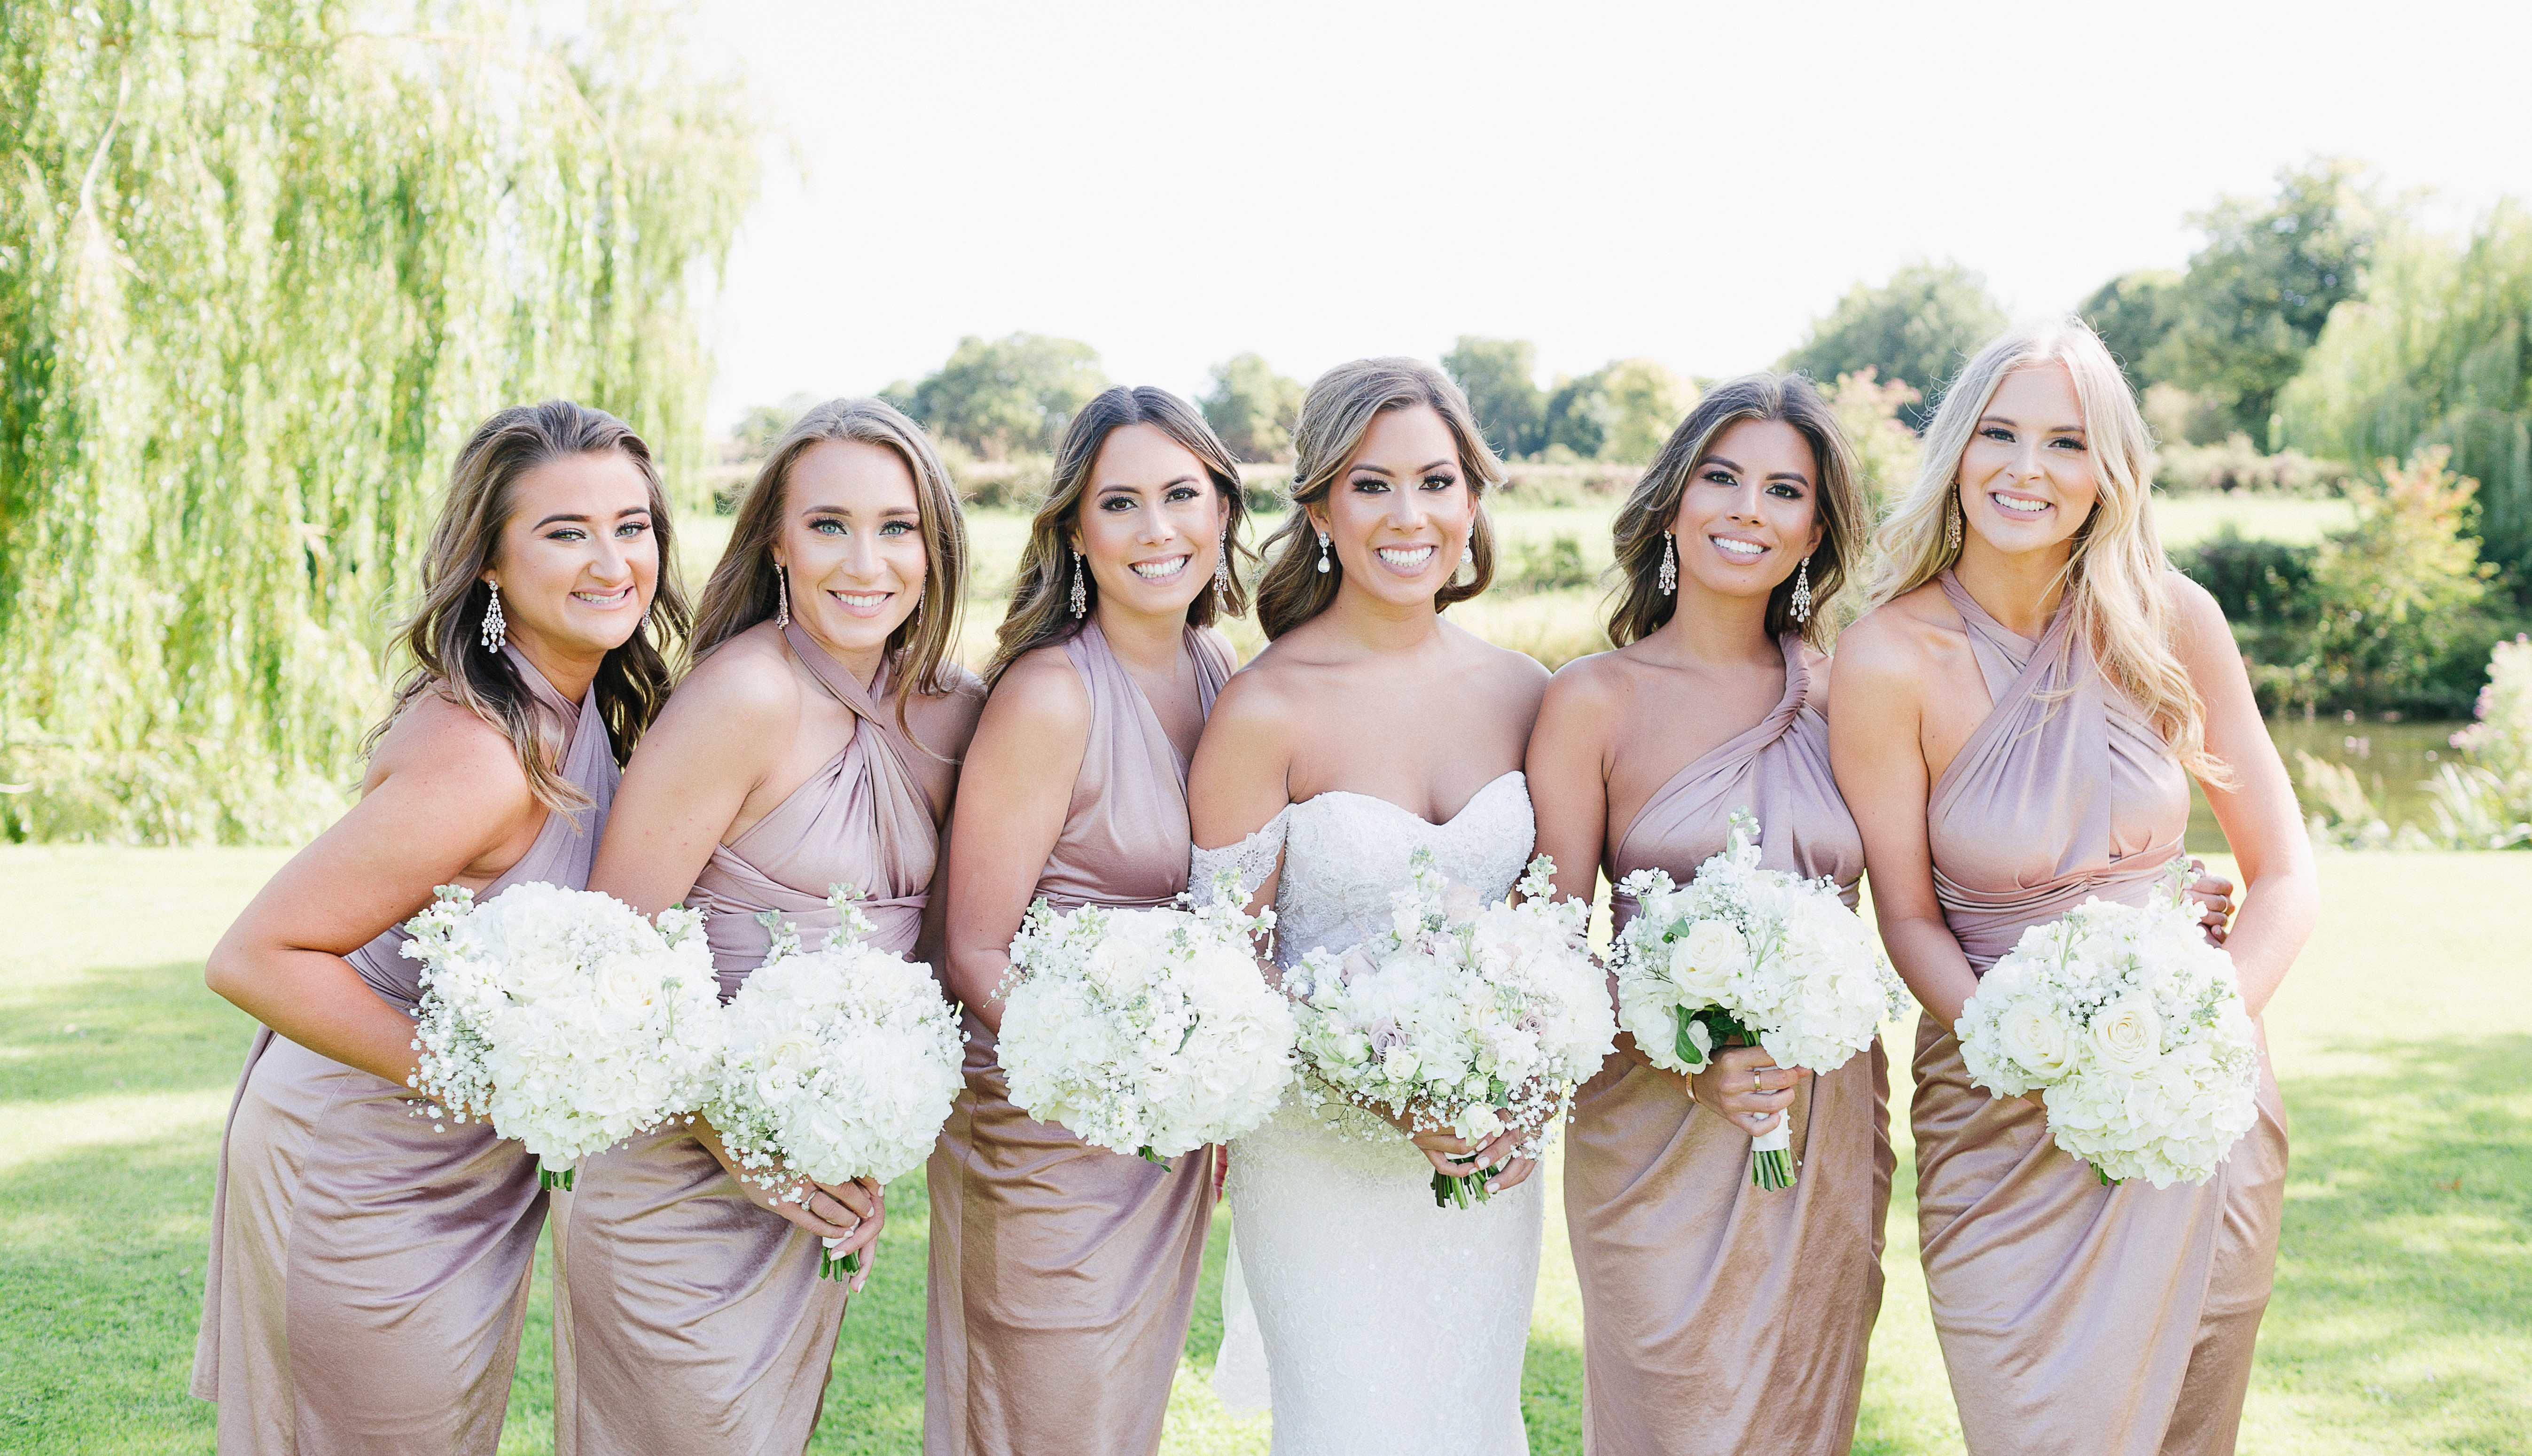 Ardington-house-wedding-ilaria-petrucci-photography-sophie-and-david-570 copy